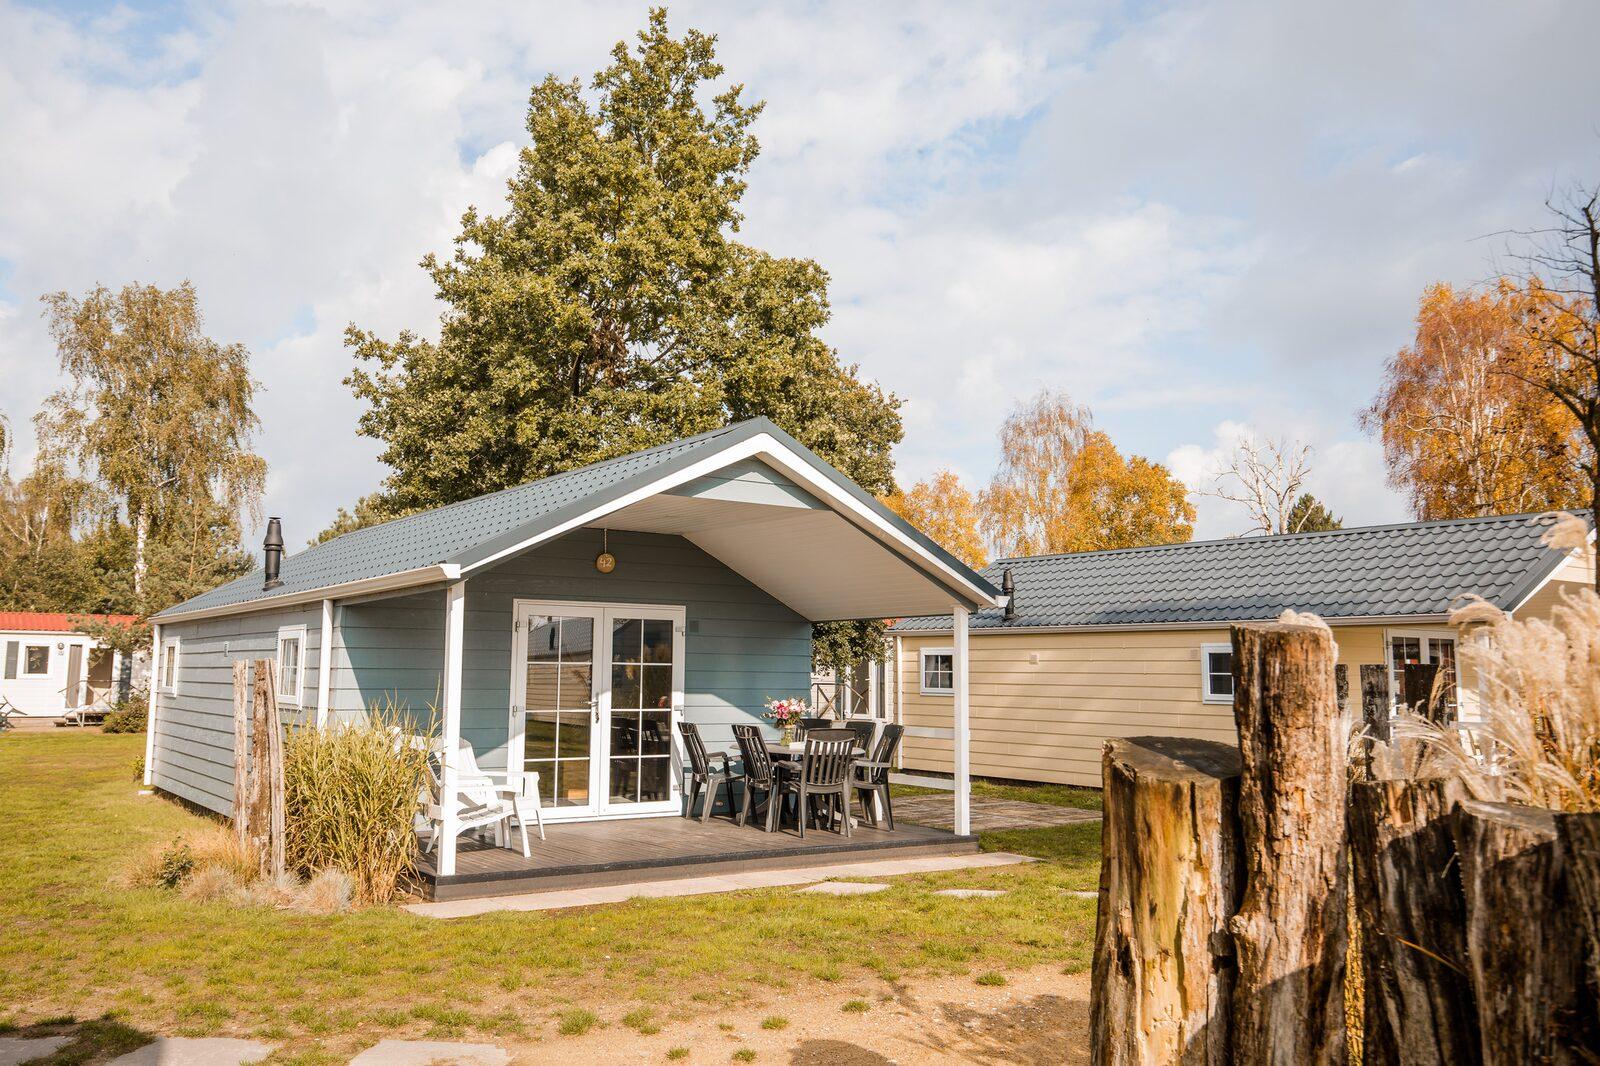 Lodge | 6 people